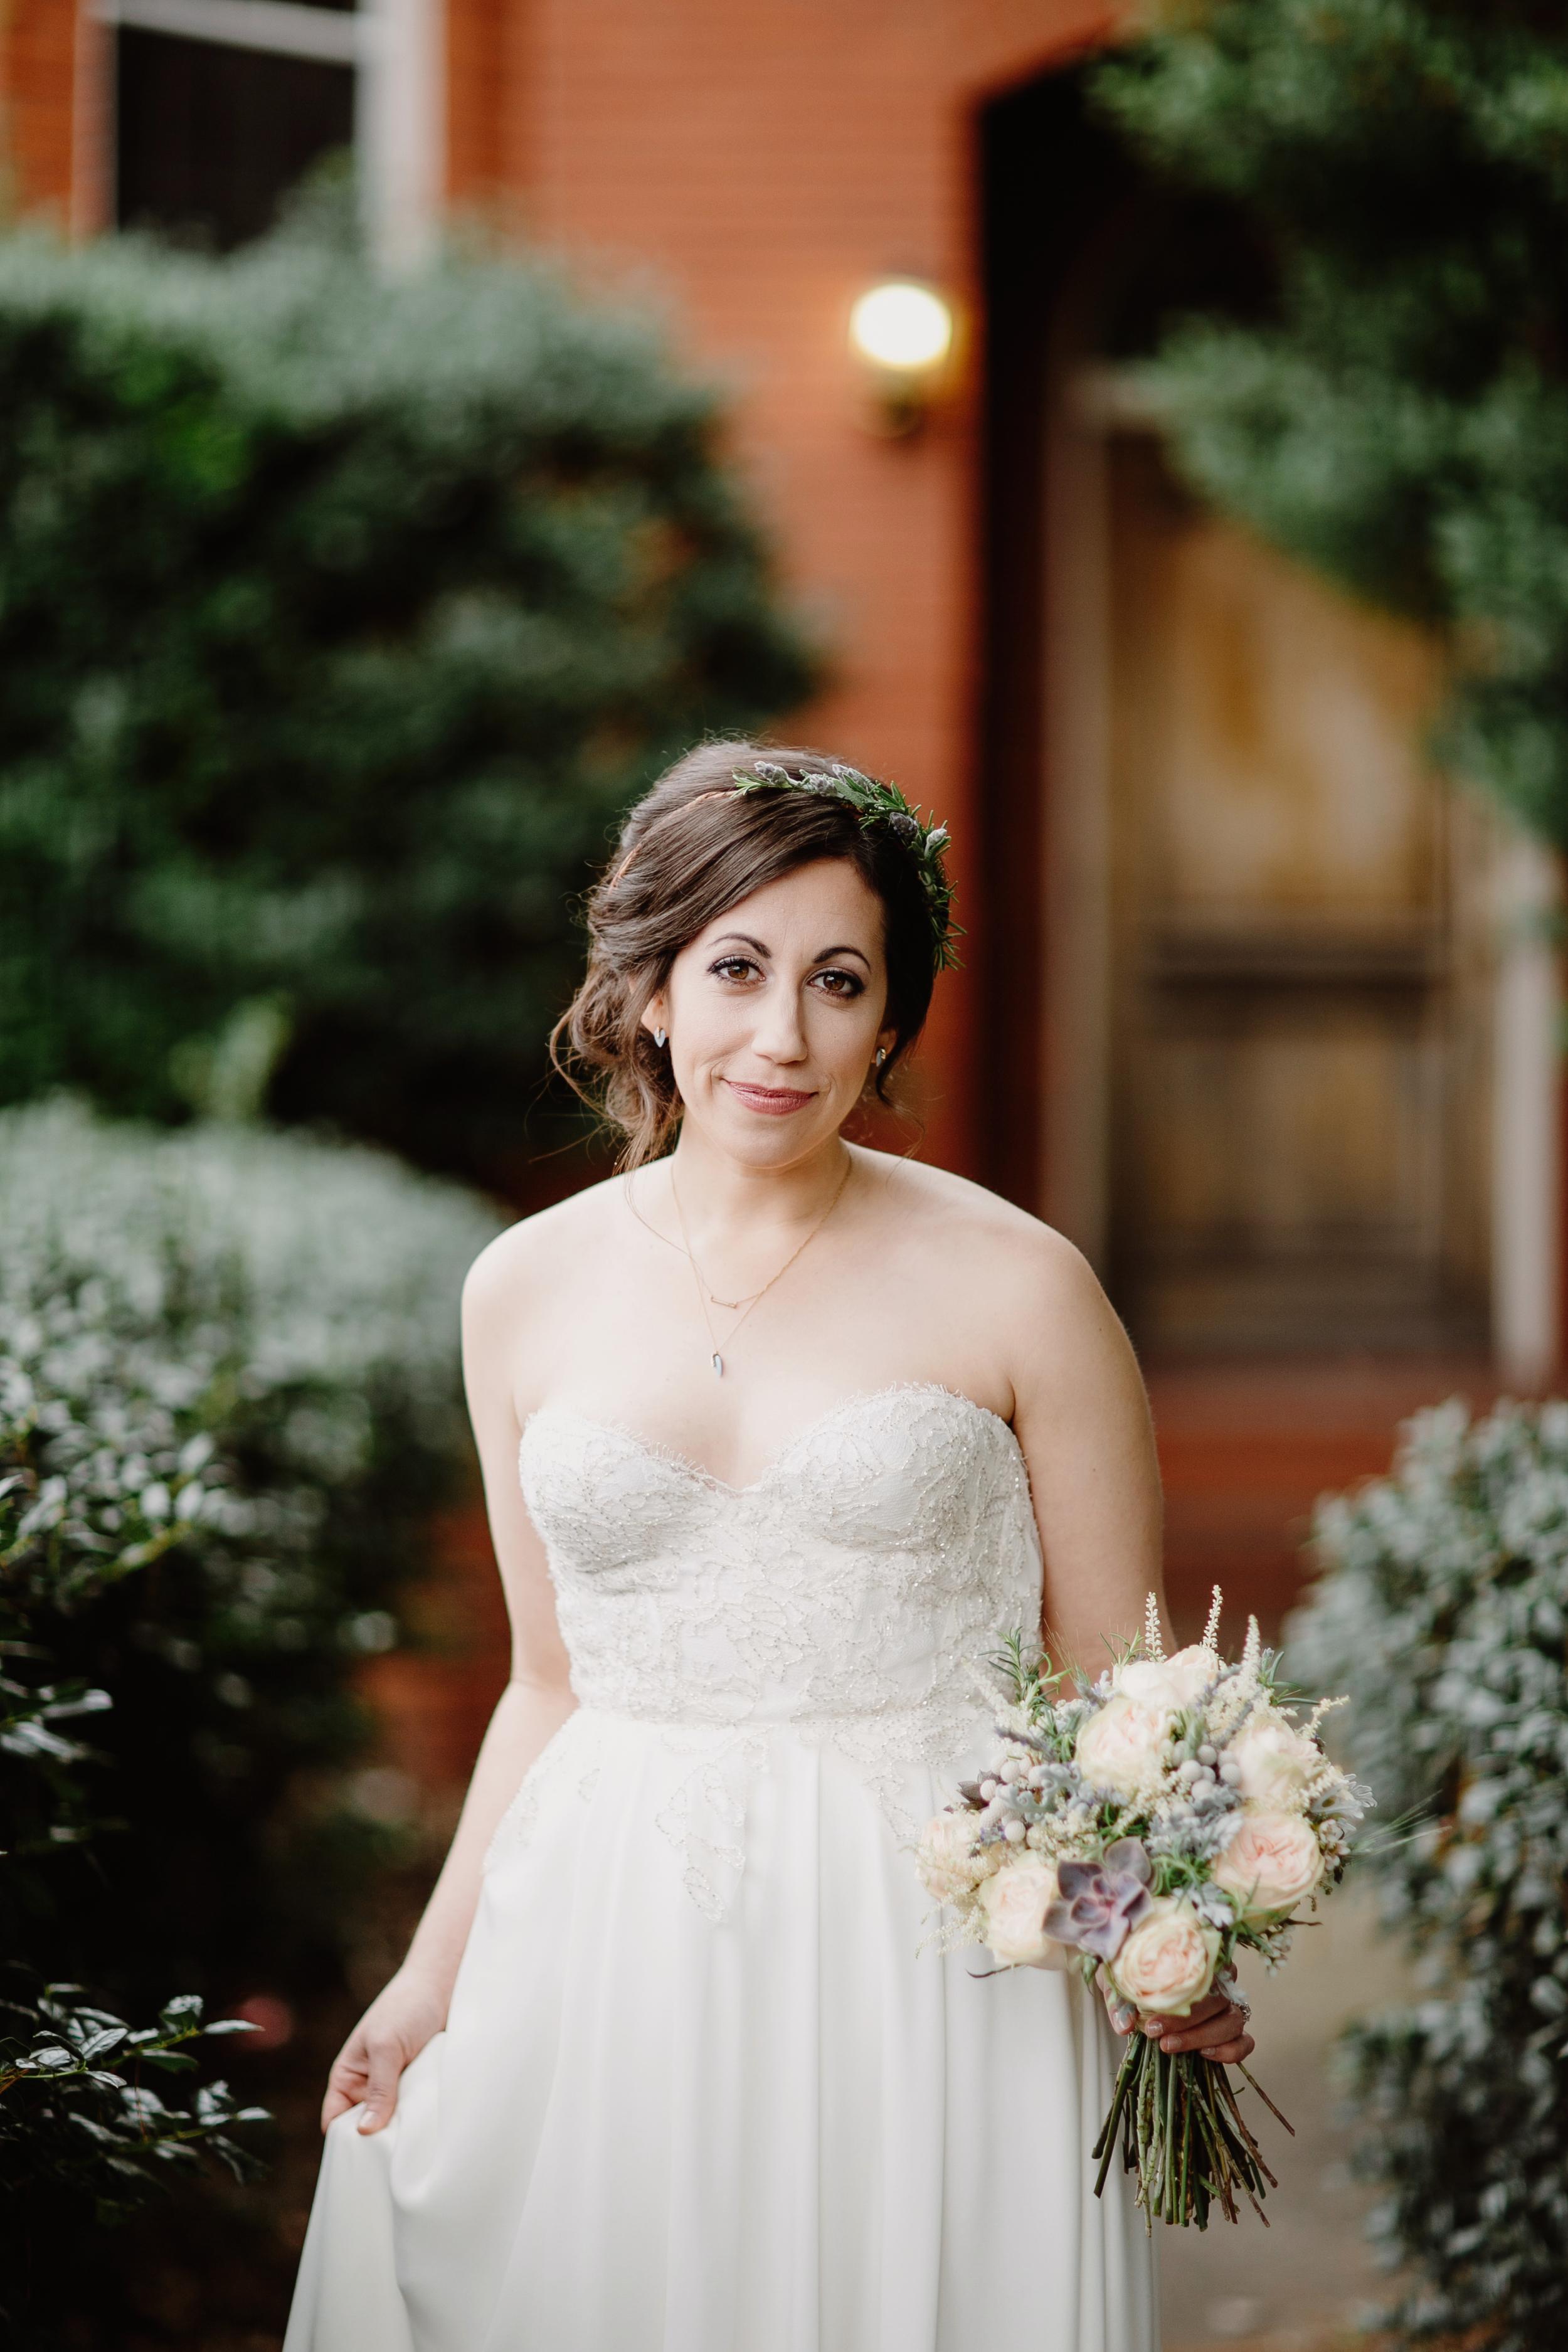 Cordelle Bride // Neutral and lavender wedding flowers